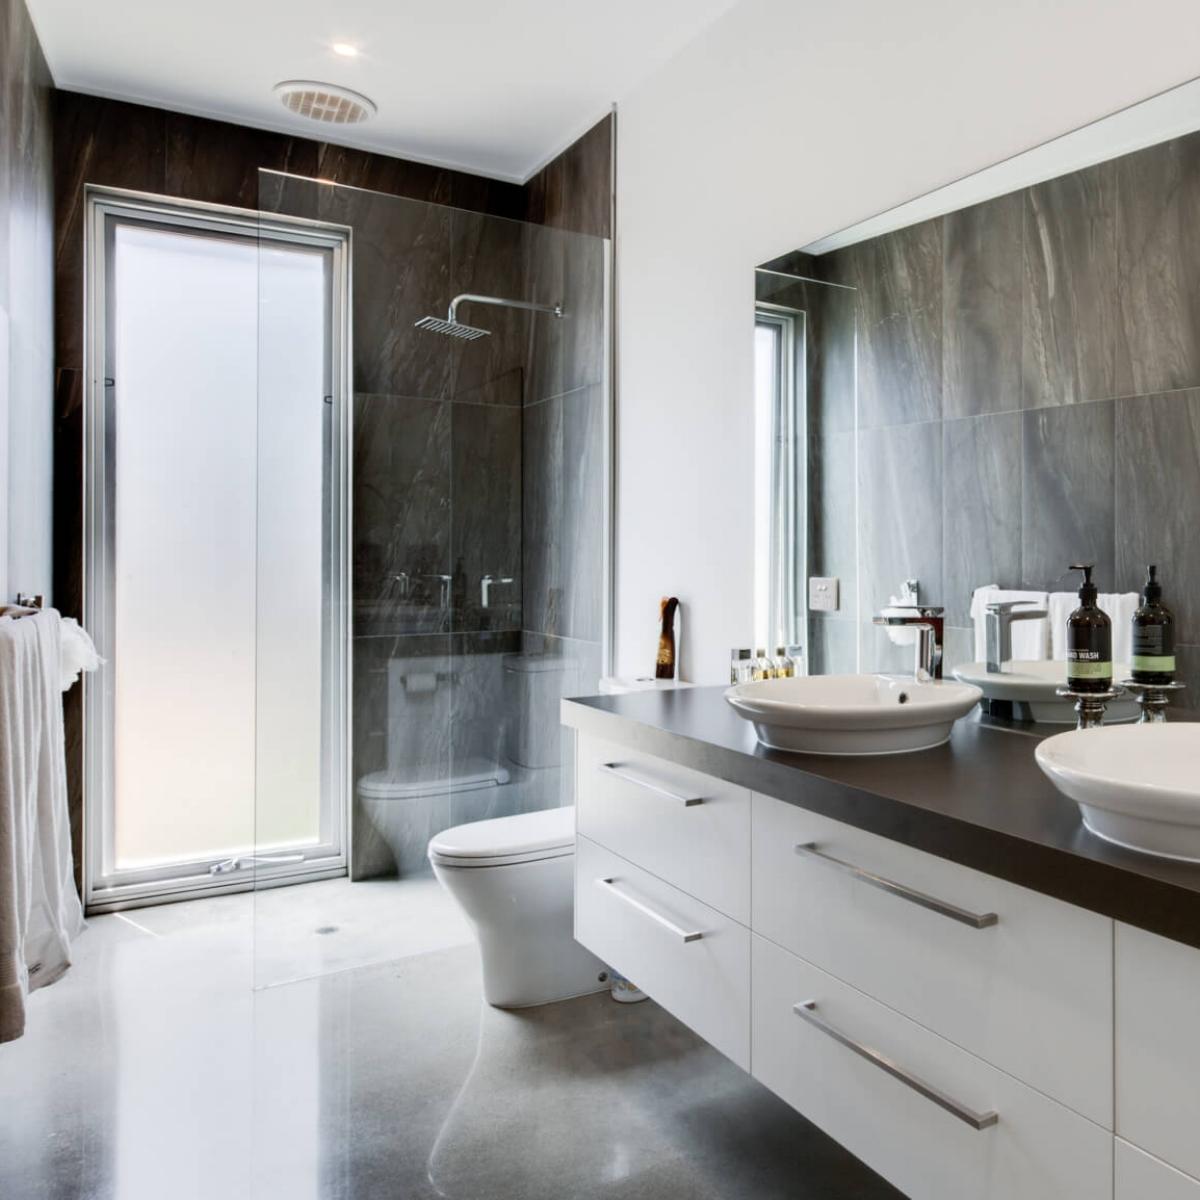 susan-bathroom.jpg